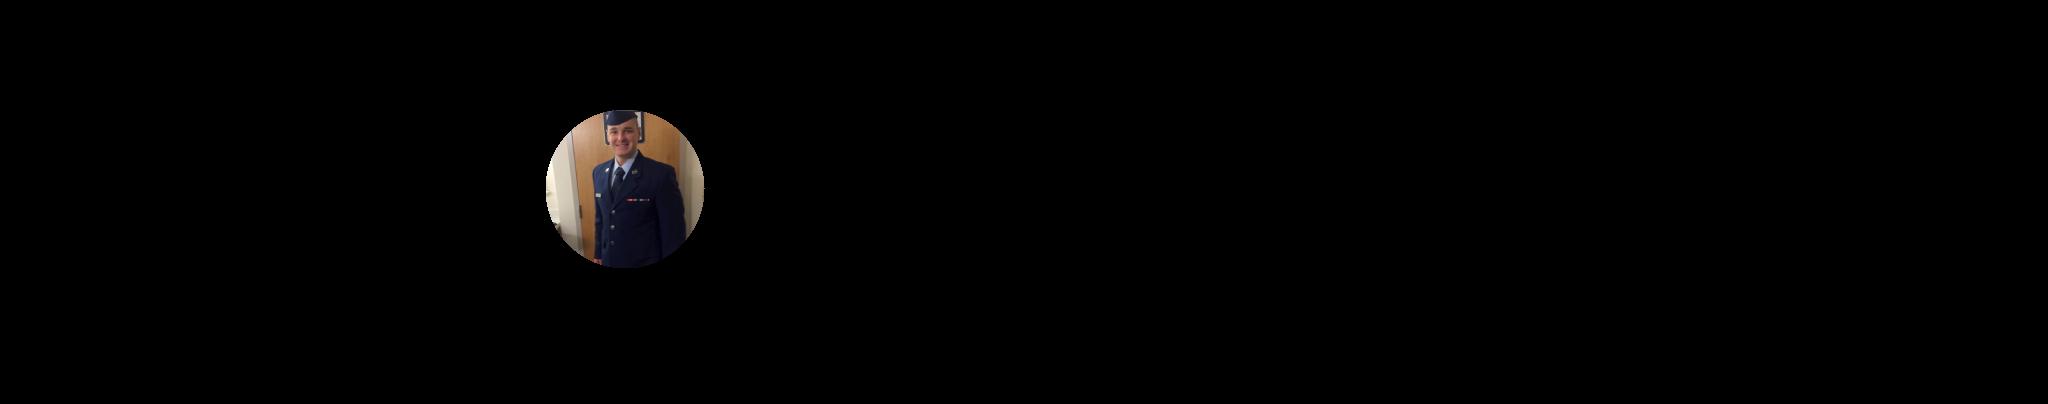 derek-dawson-testimonial-100.png